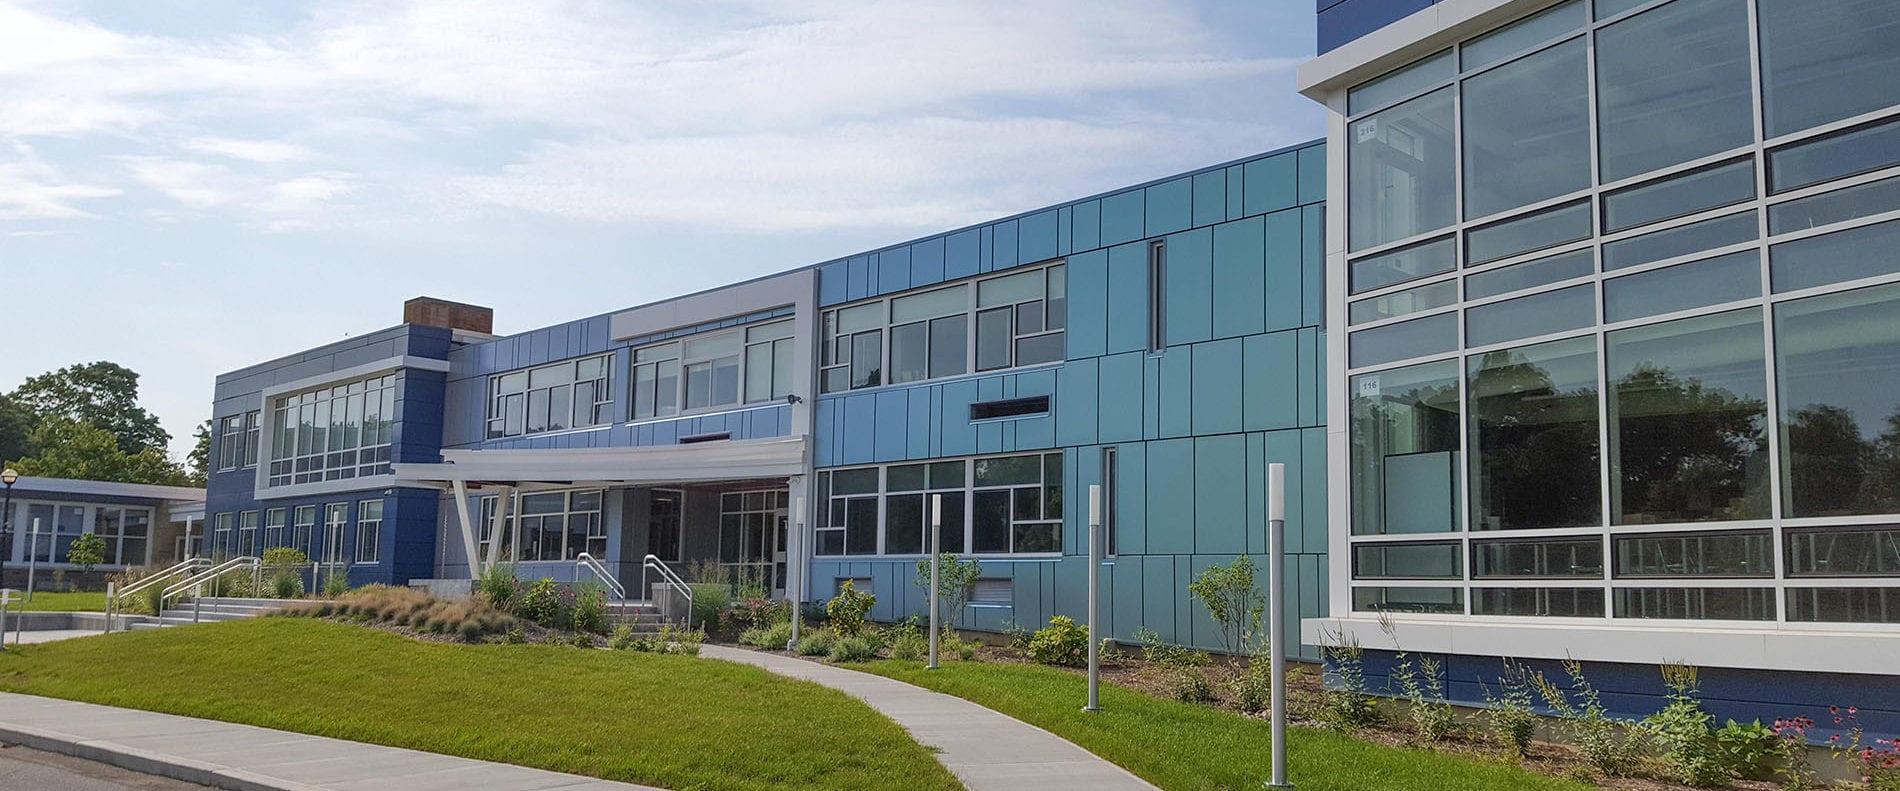 Maple Hill Jr. High School